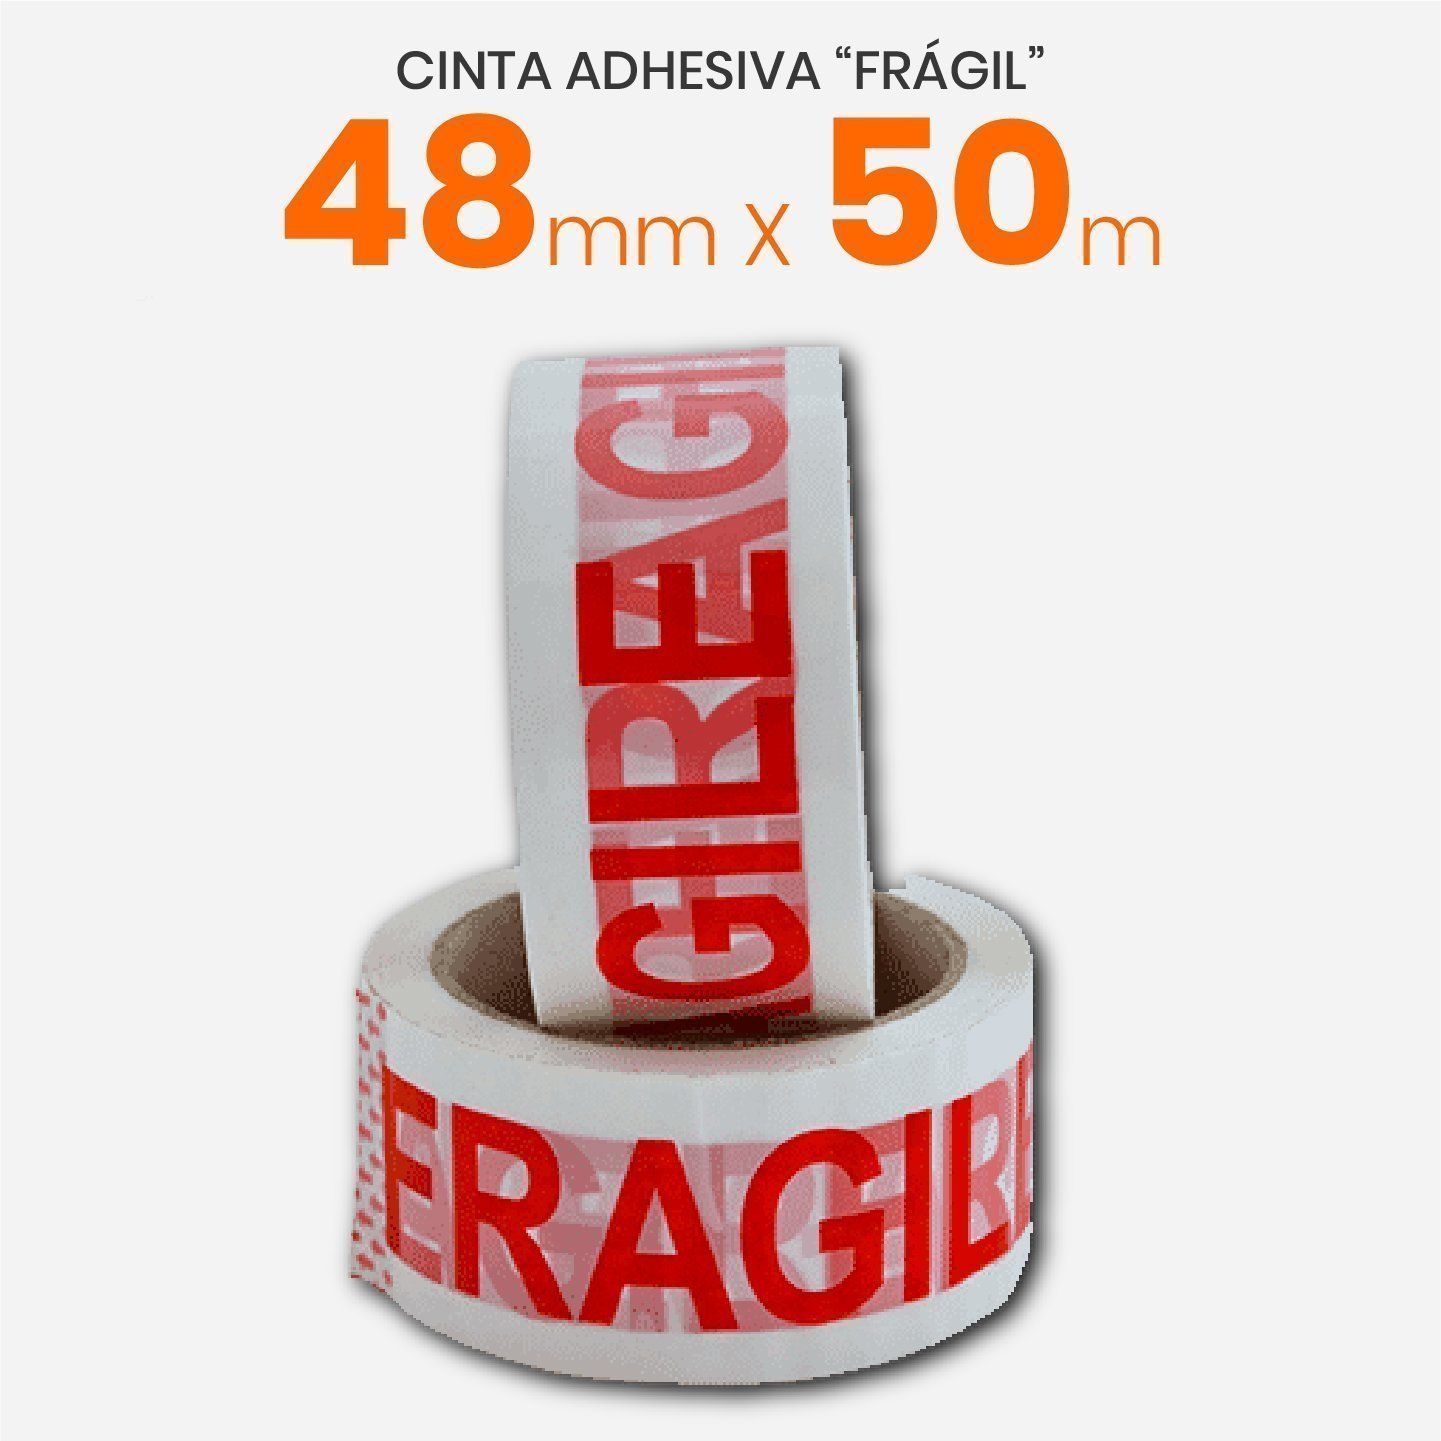 Cinta Adhesiva Frágil 48mm x 50mts